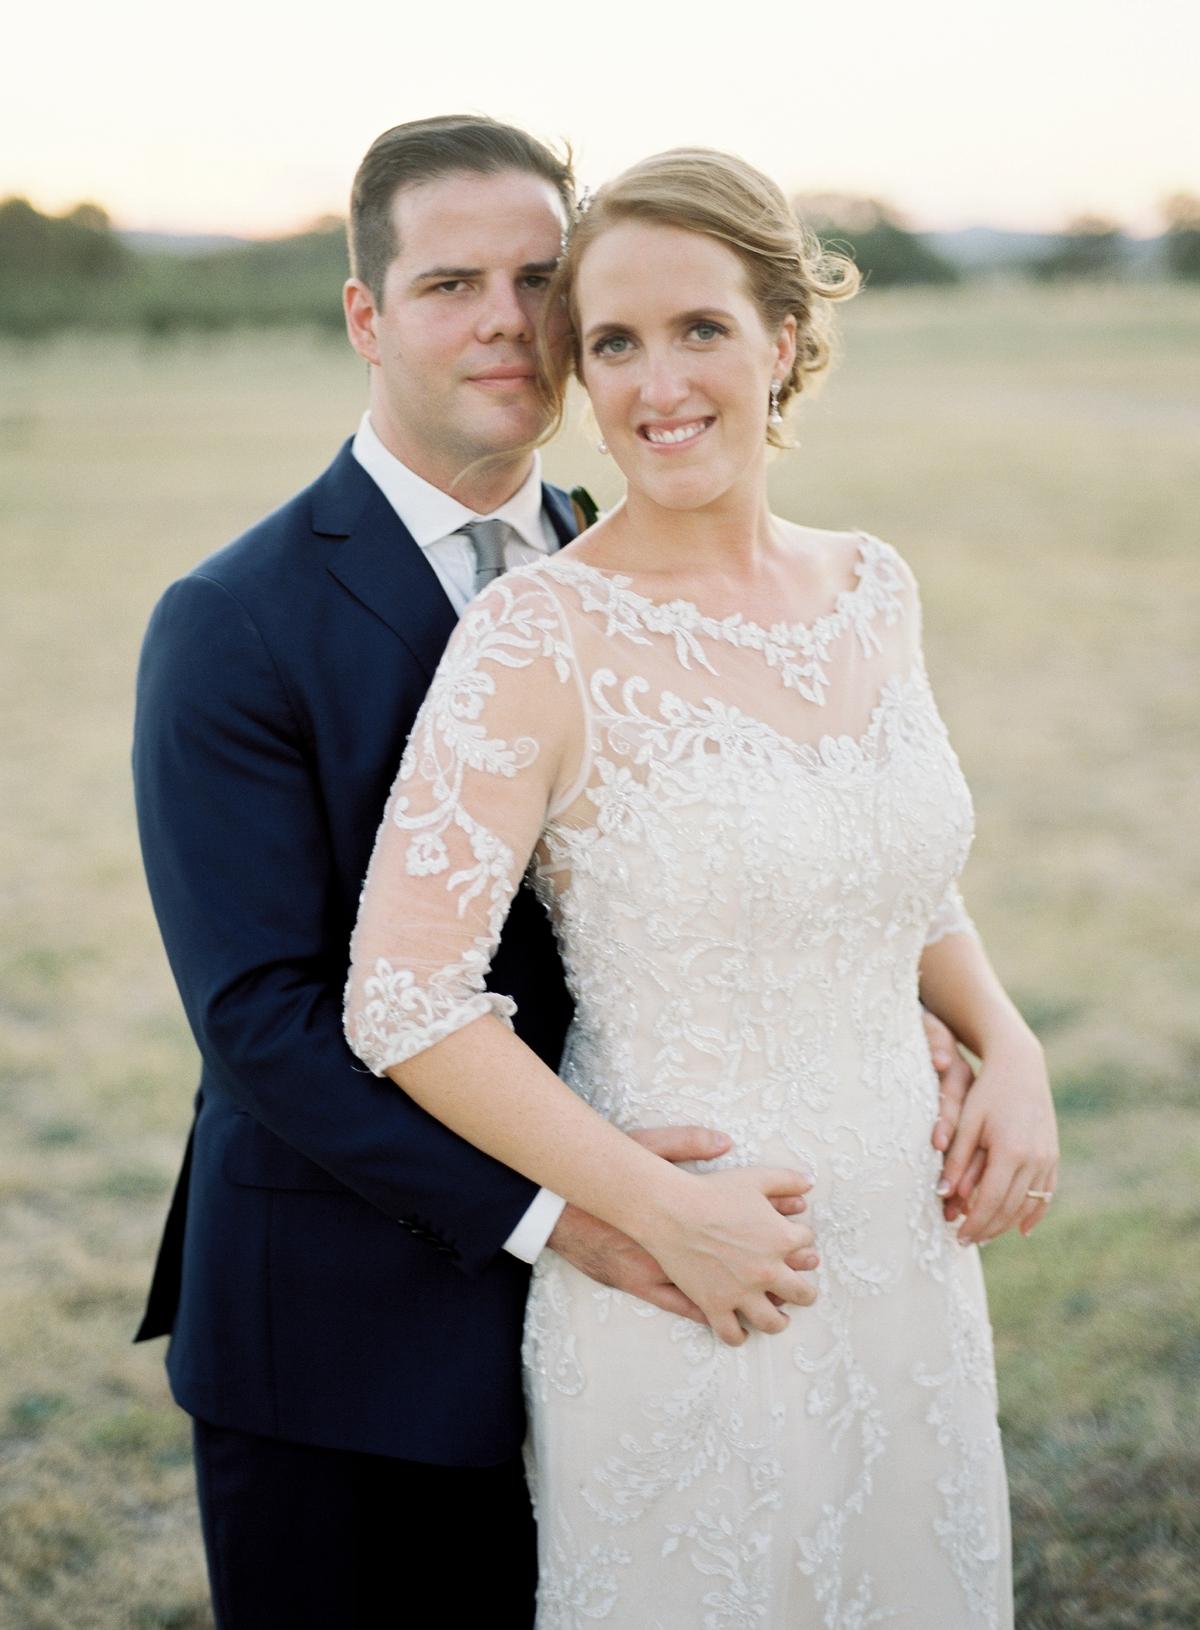 The Vine Grove Mudgee Wedding, Photography by Mr Edwards_1820.jpg